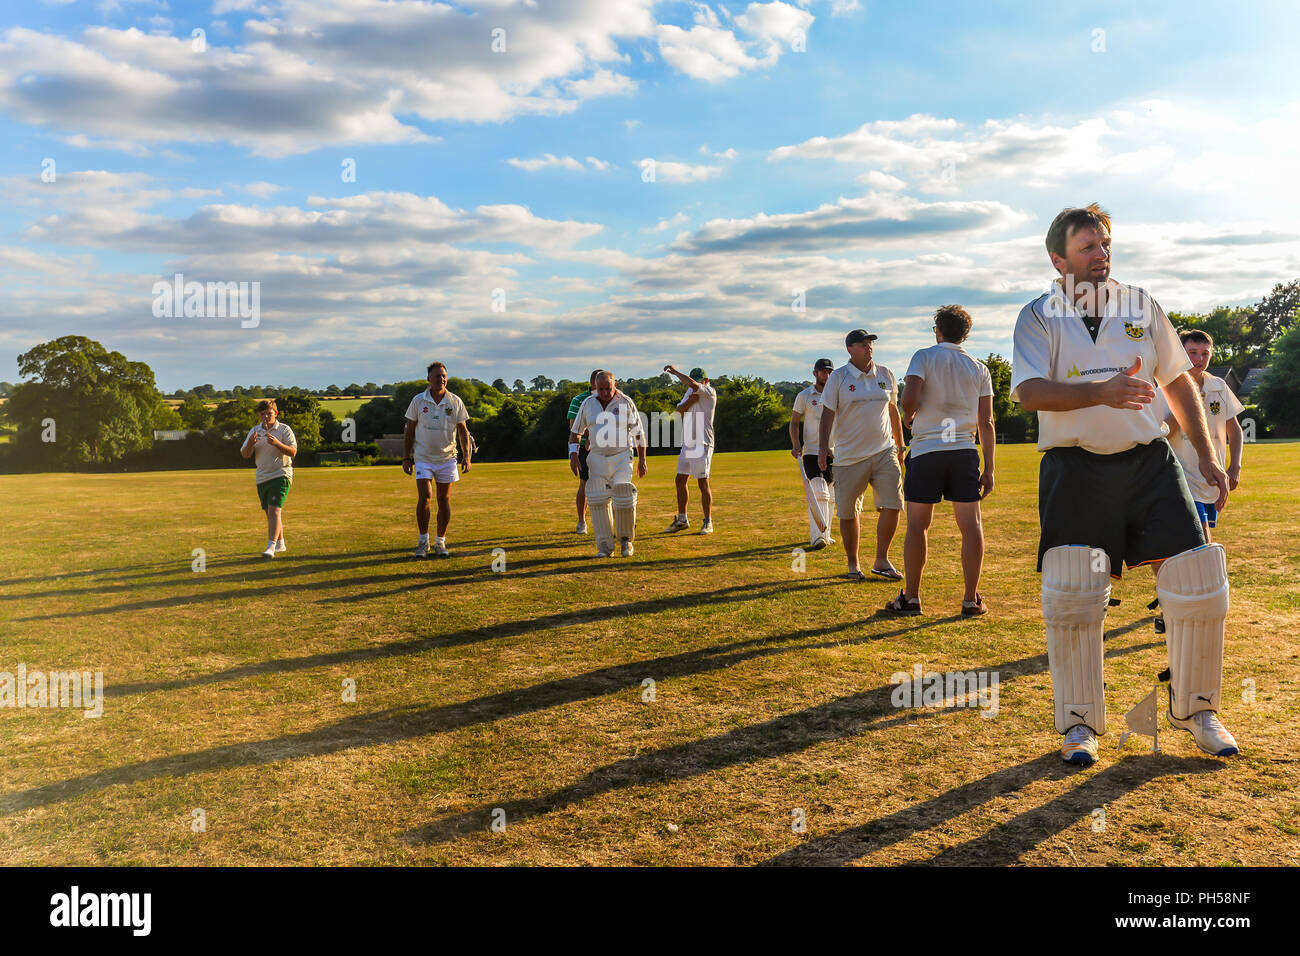 Blaksley - UK - 08/05/18 - Summer cricket in Northamptonshire - Blaksley - UK Stock Photo